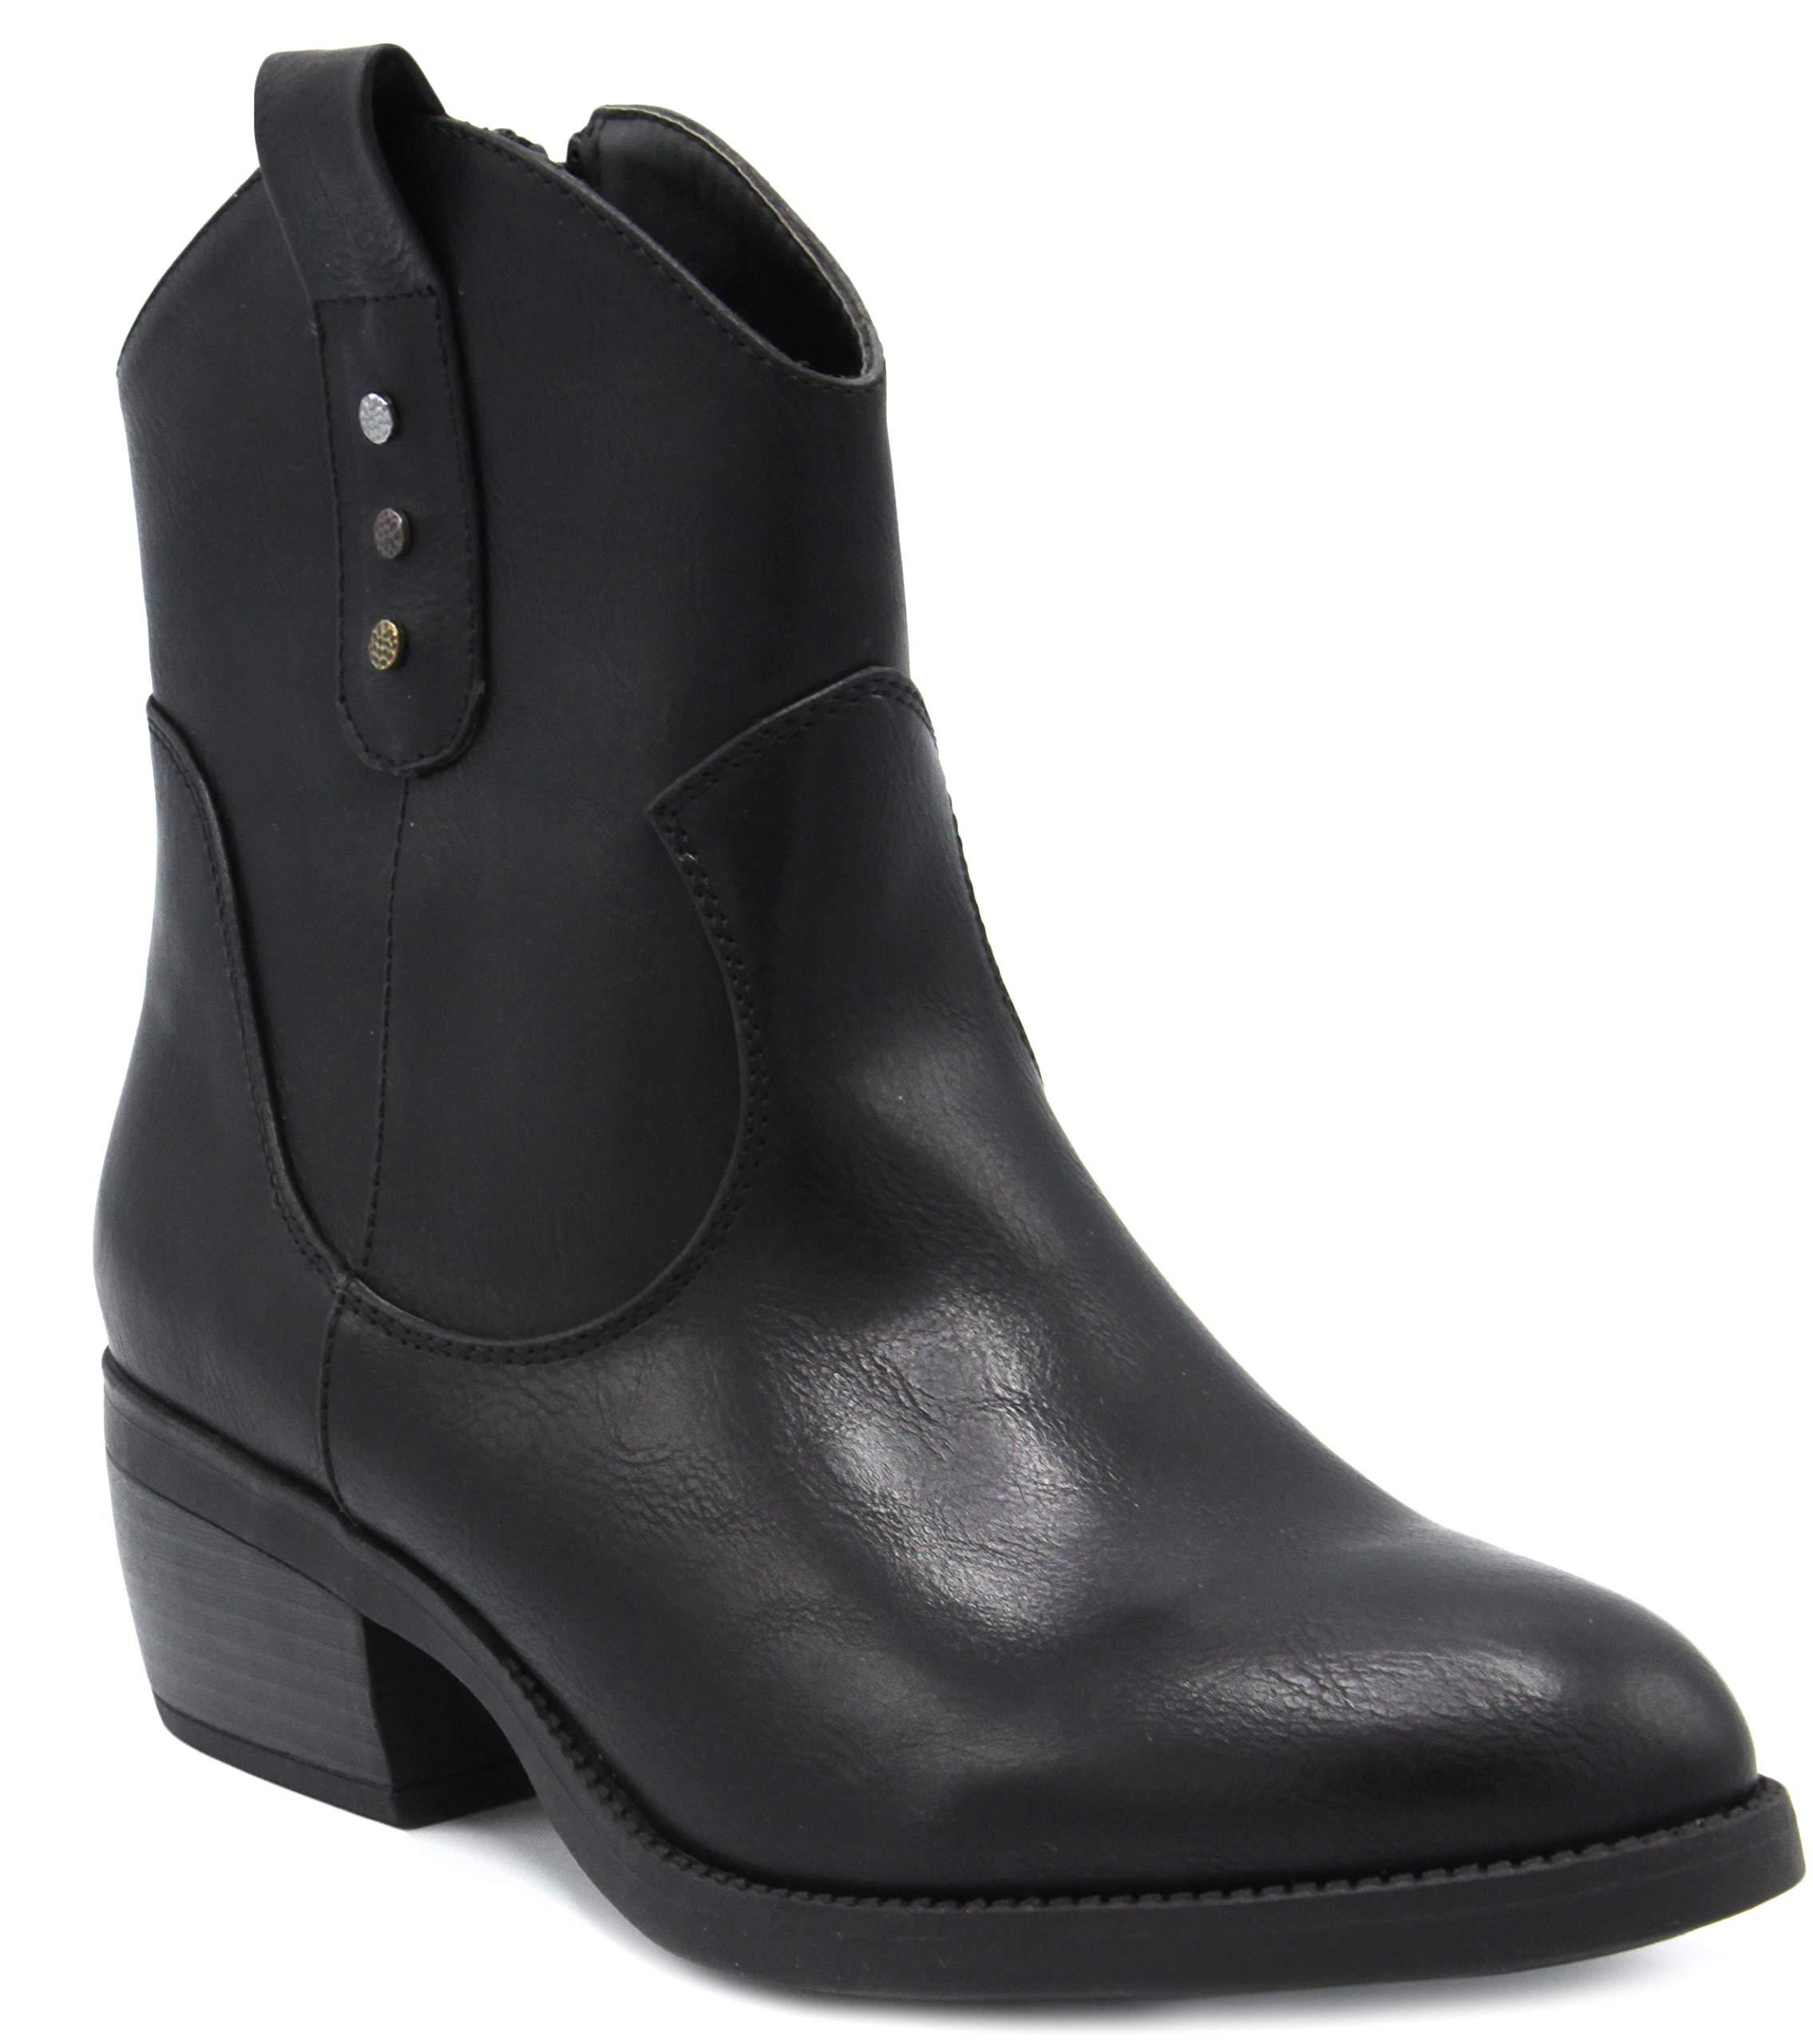 Rampage Women's Thriller Low Shaft Mid Calf Western Ladies Boot with Side Zip Black 8